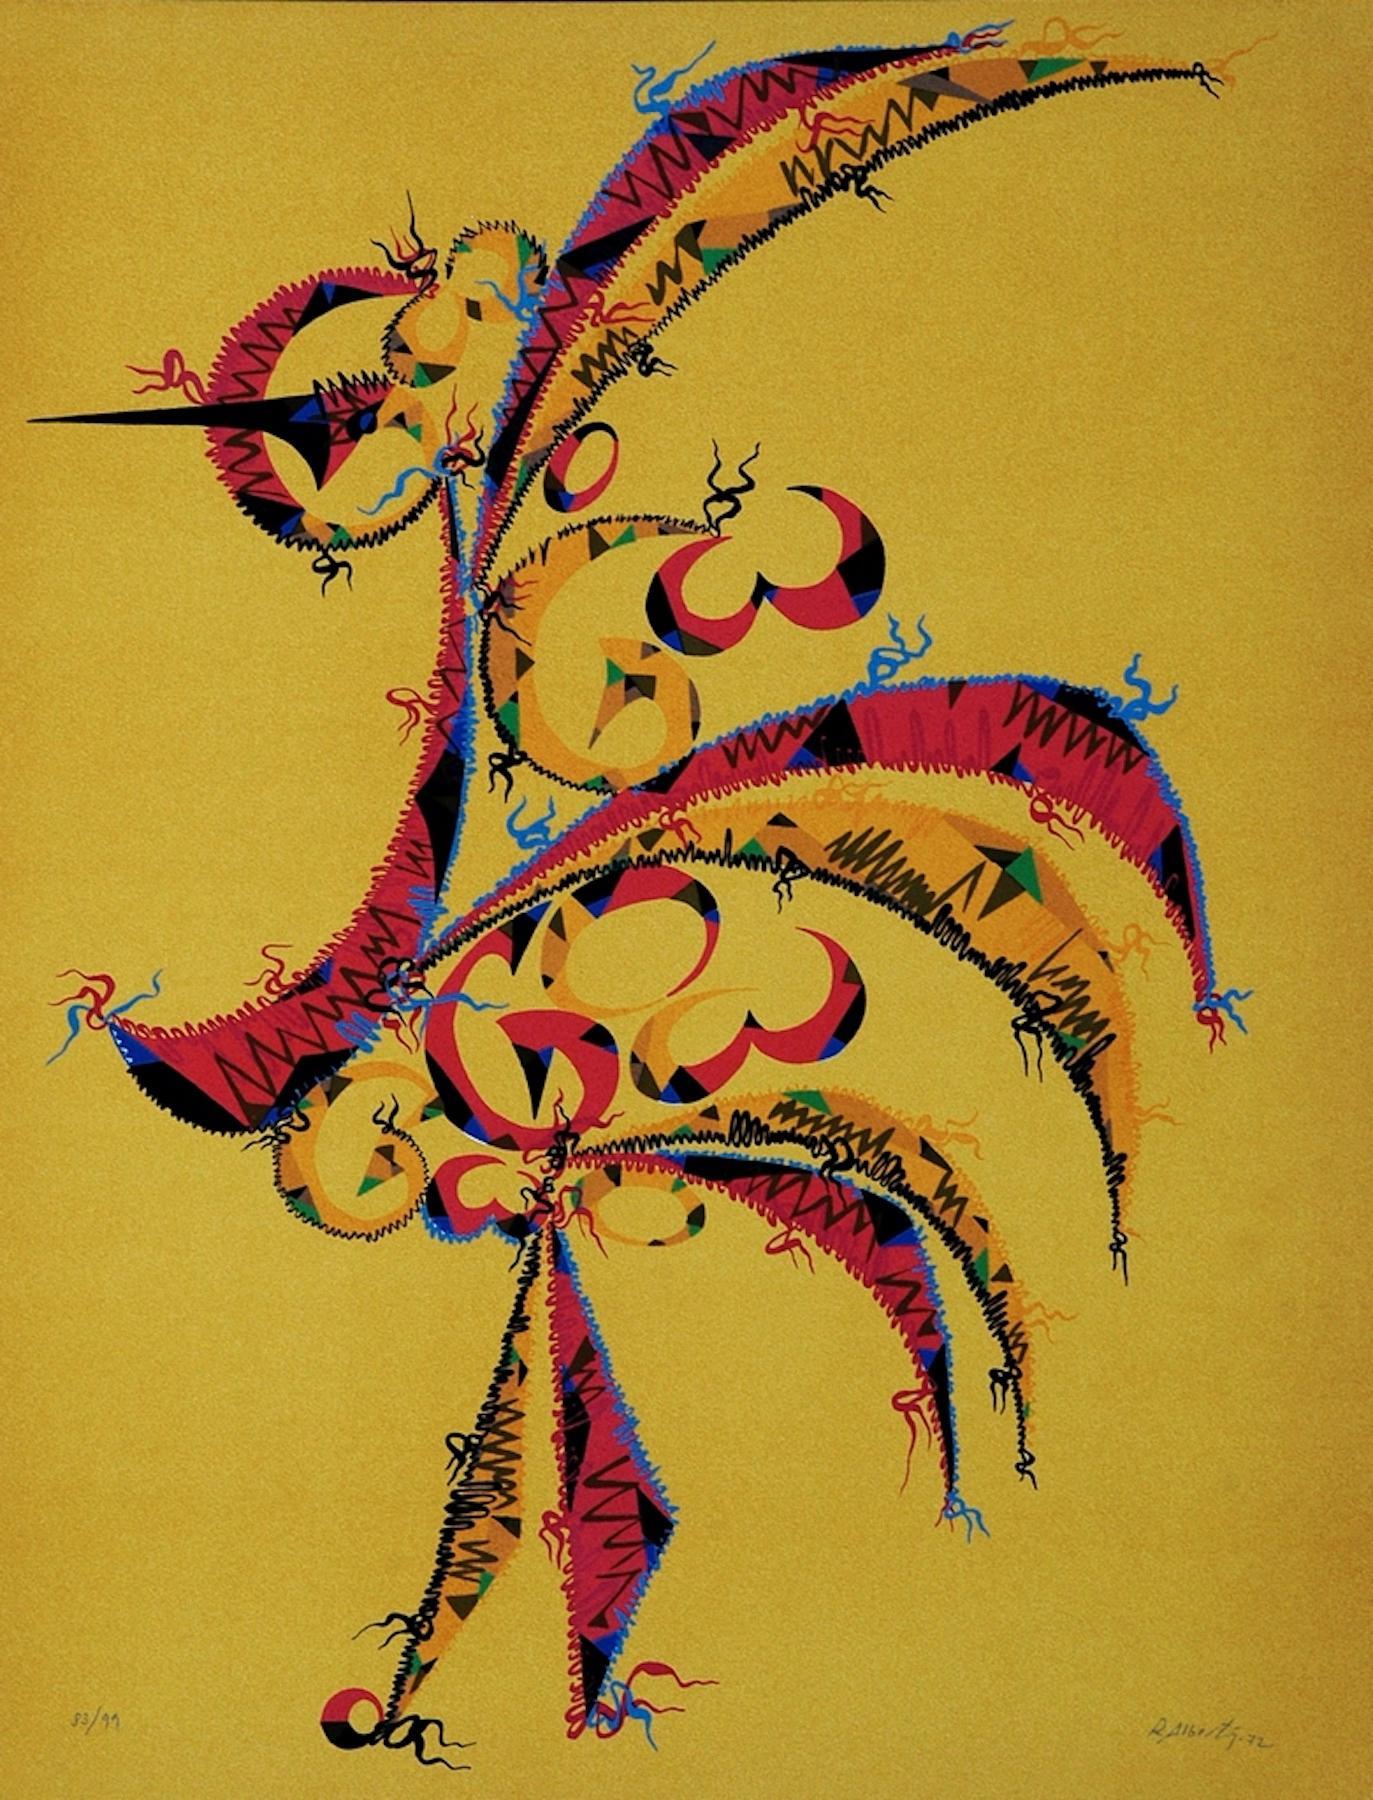 Letter G - Original Lithograph by Raphael Alberti - 1972